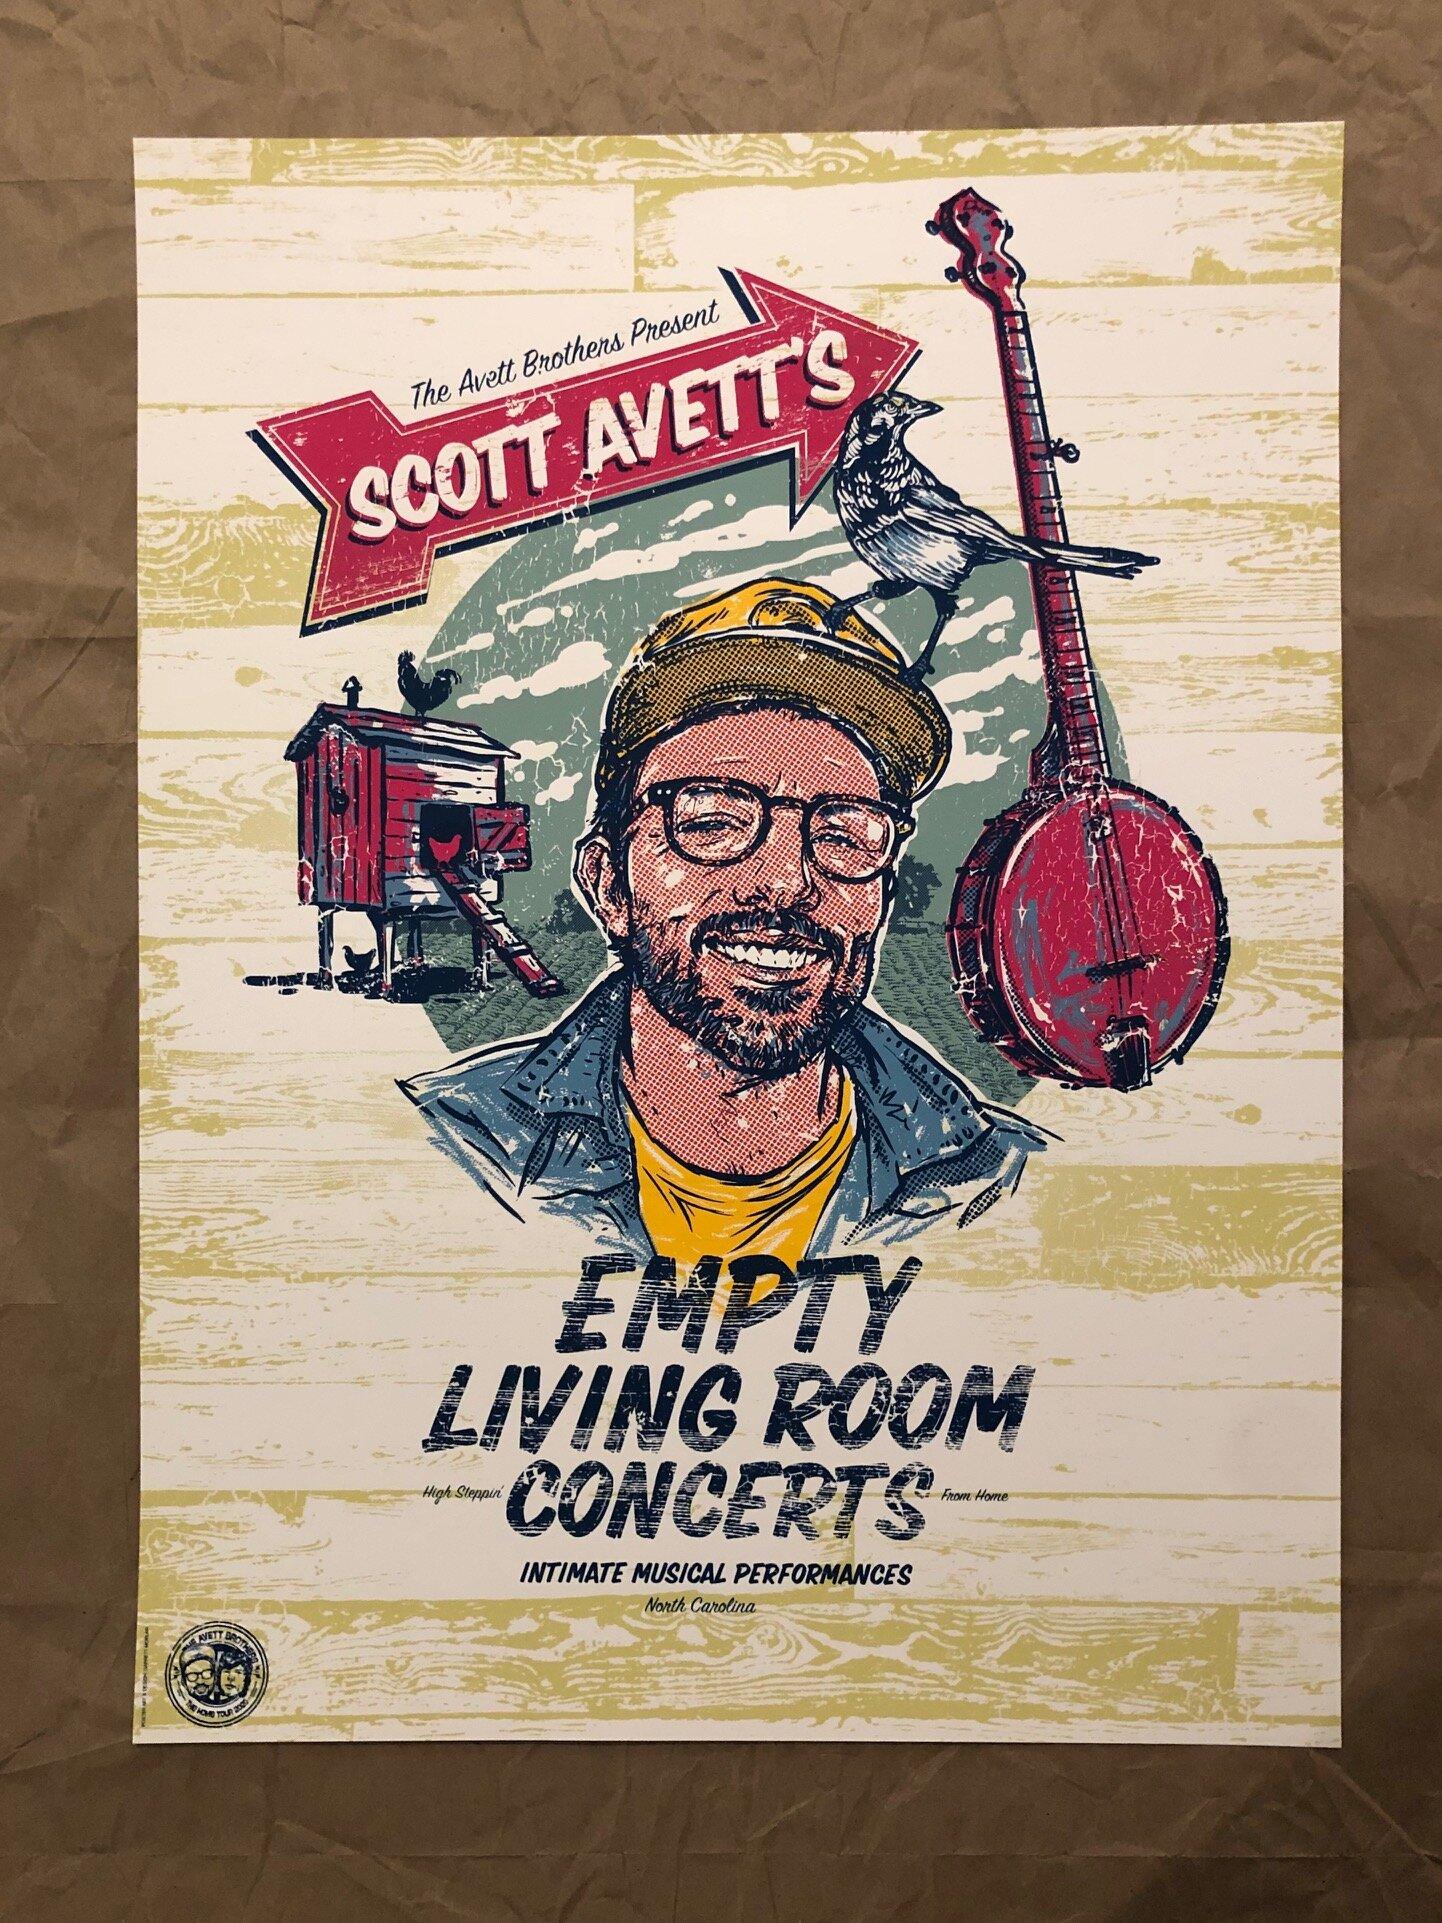 scott avett s empty living room concerts poster artist proof edition garrett morlan